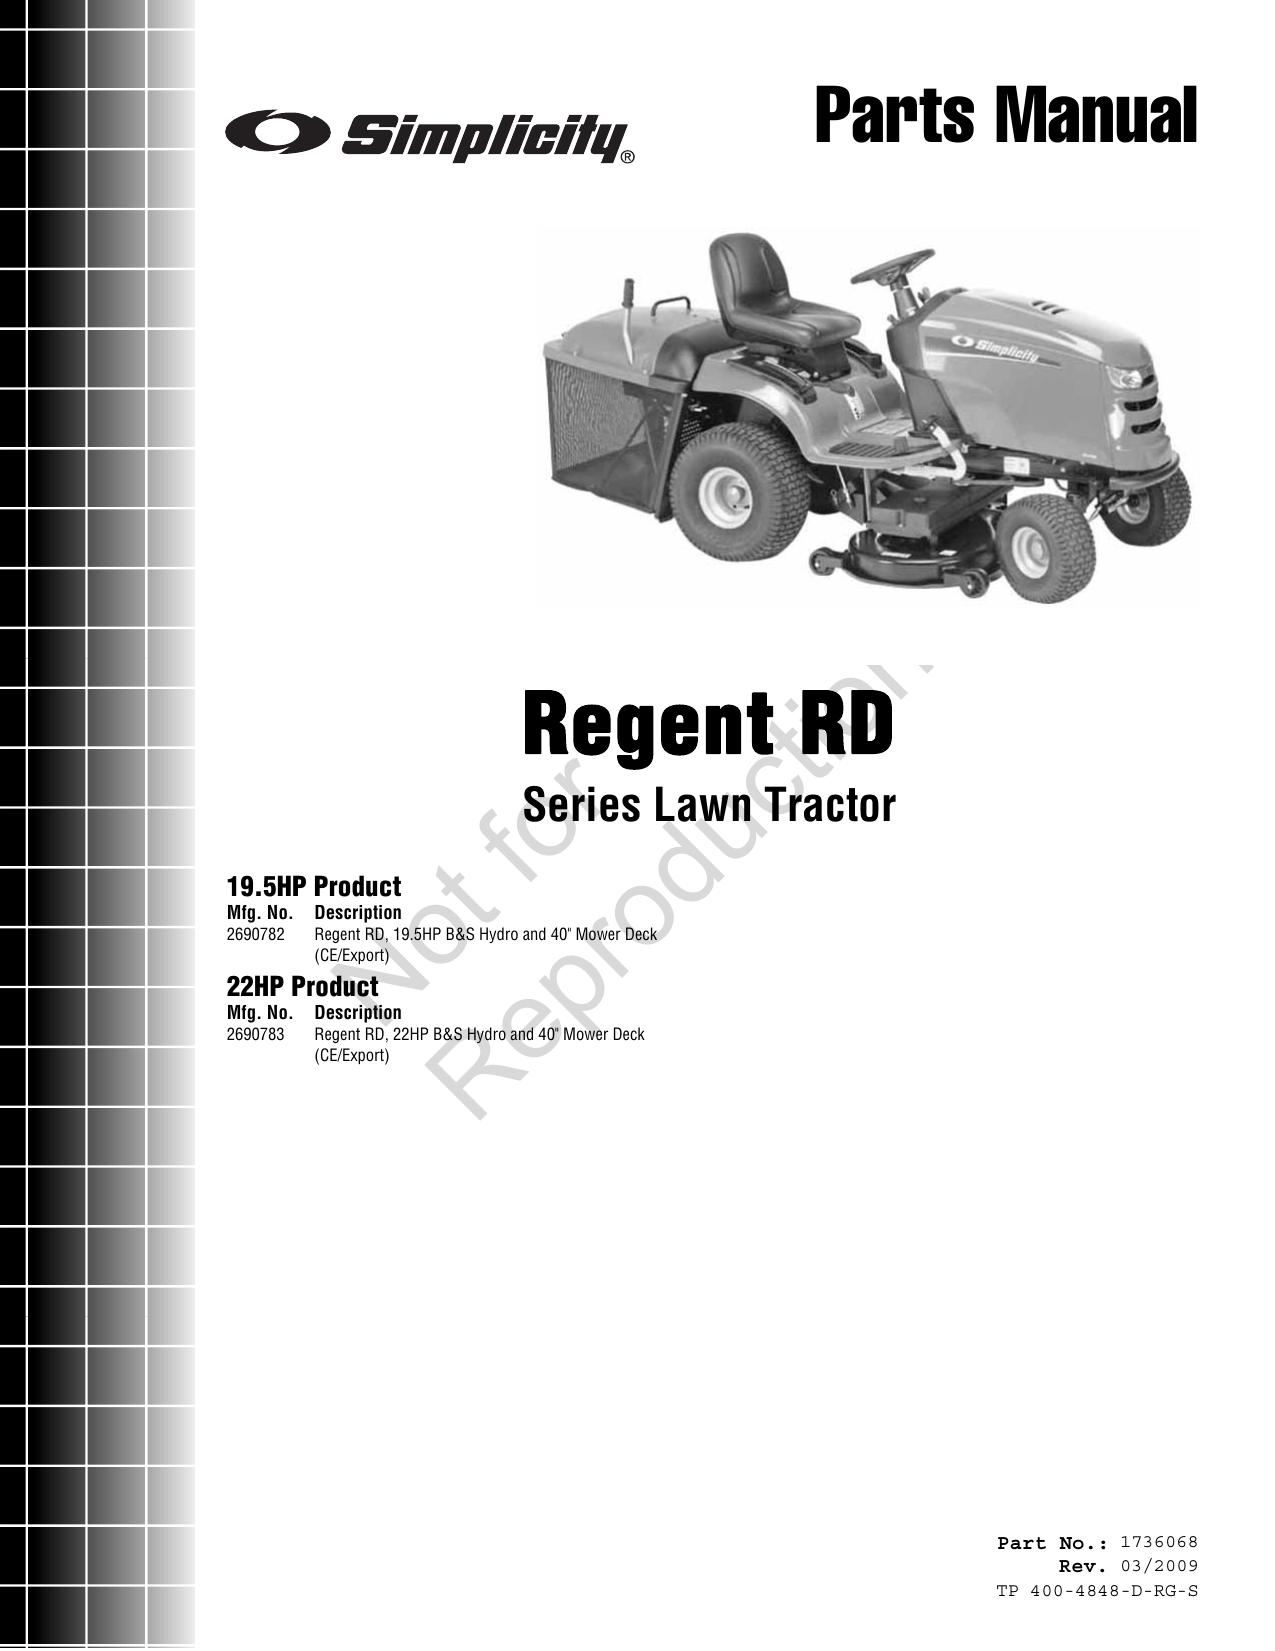 Simplicity Regent 2690783 Parts Manual RD Series Lawn Tractor